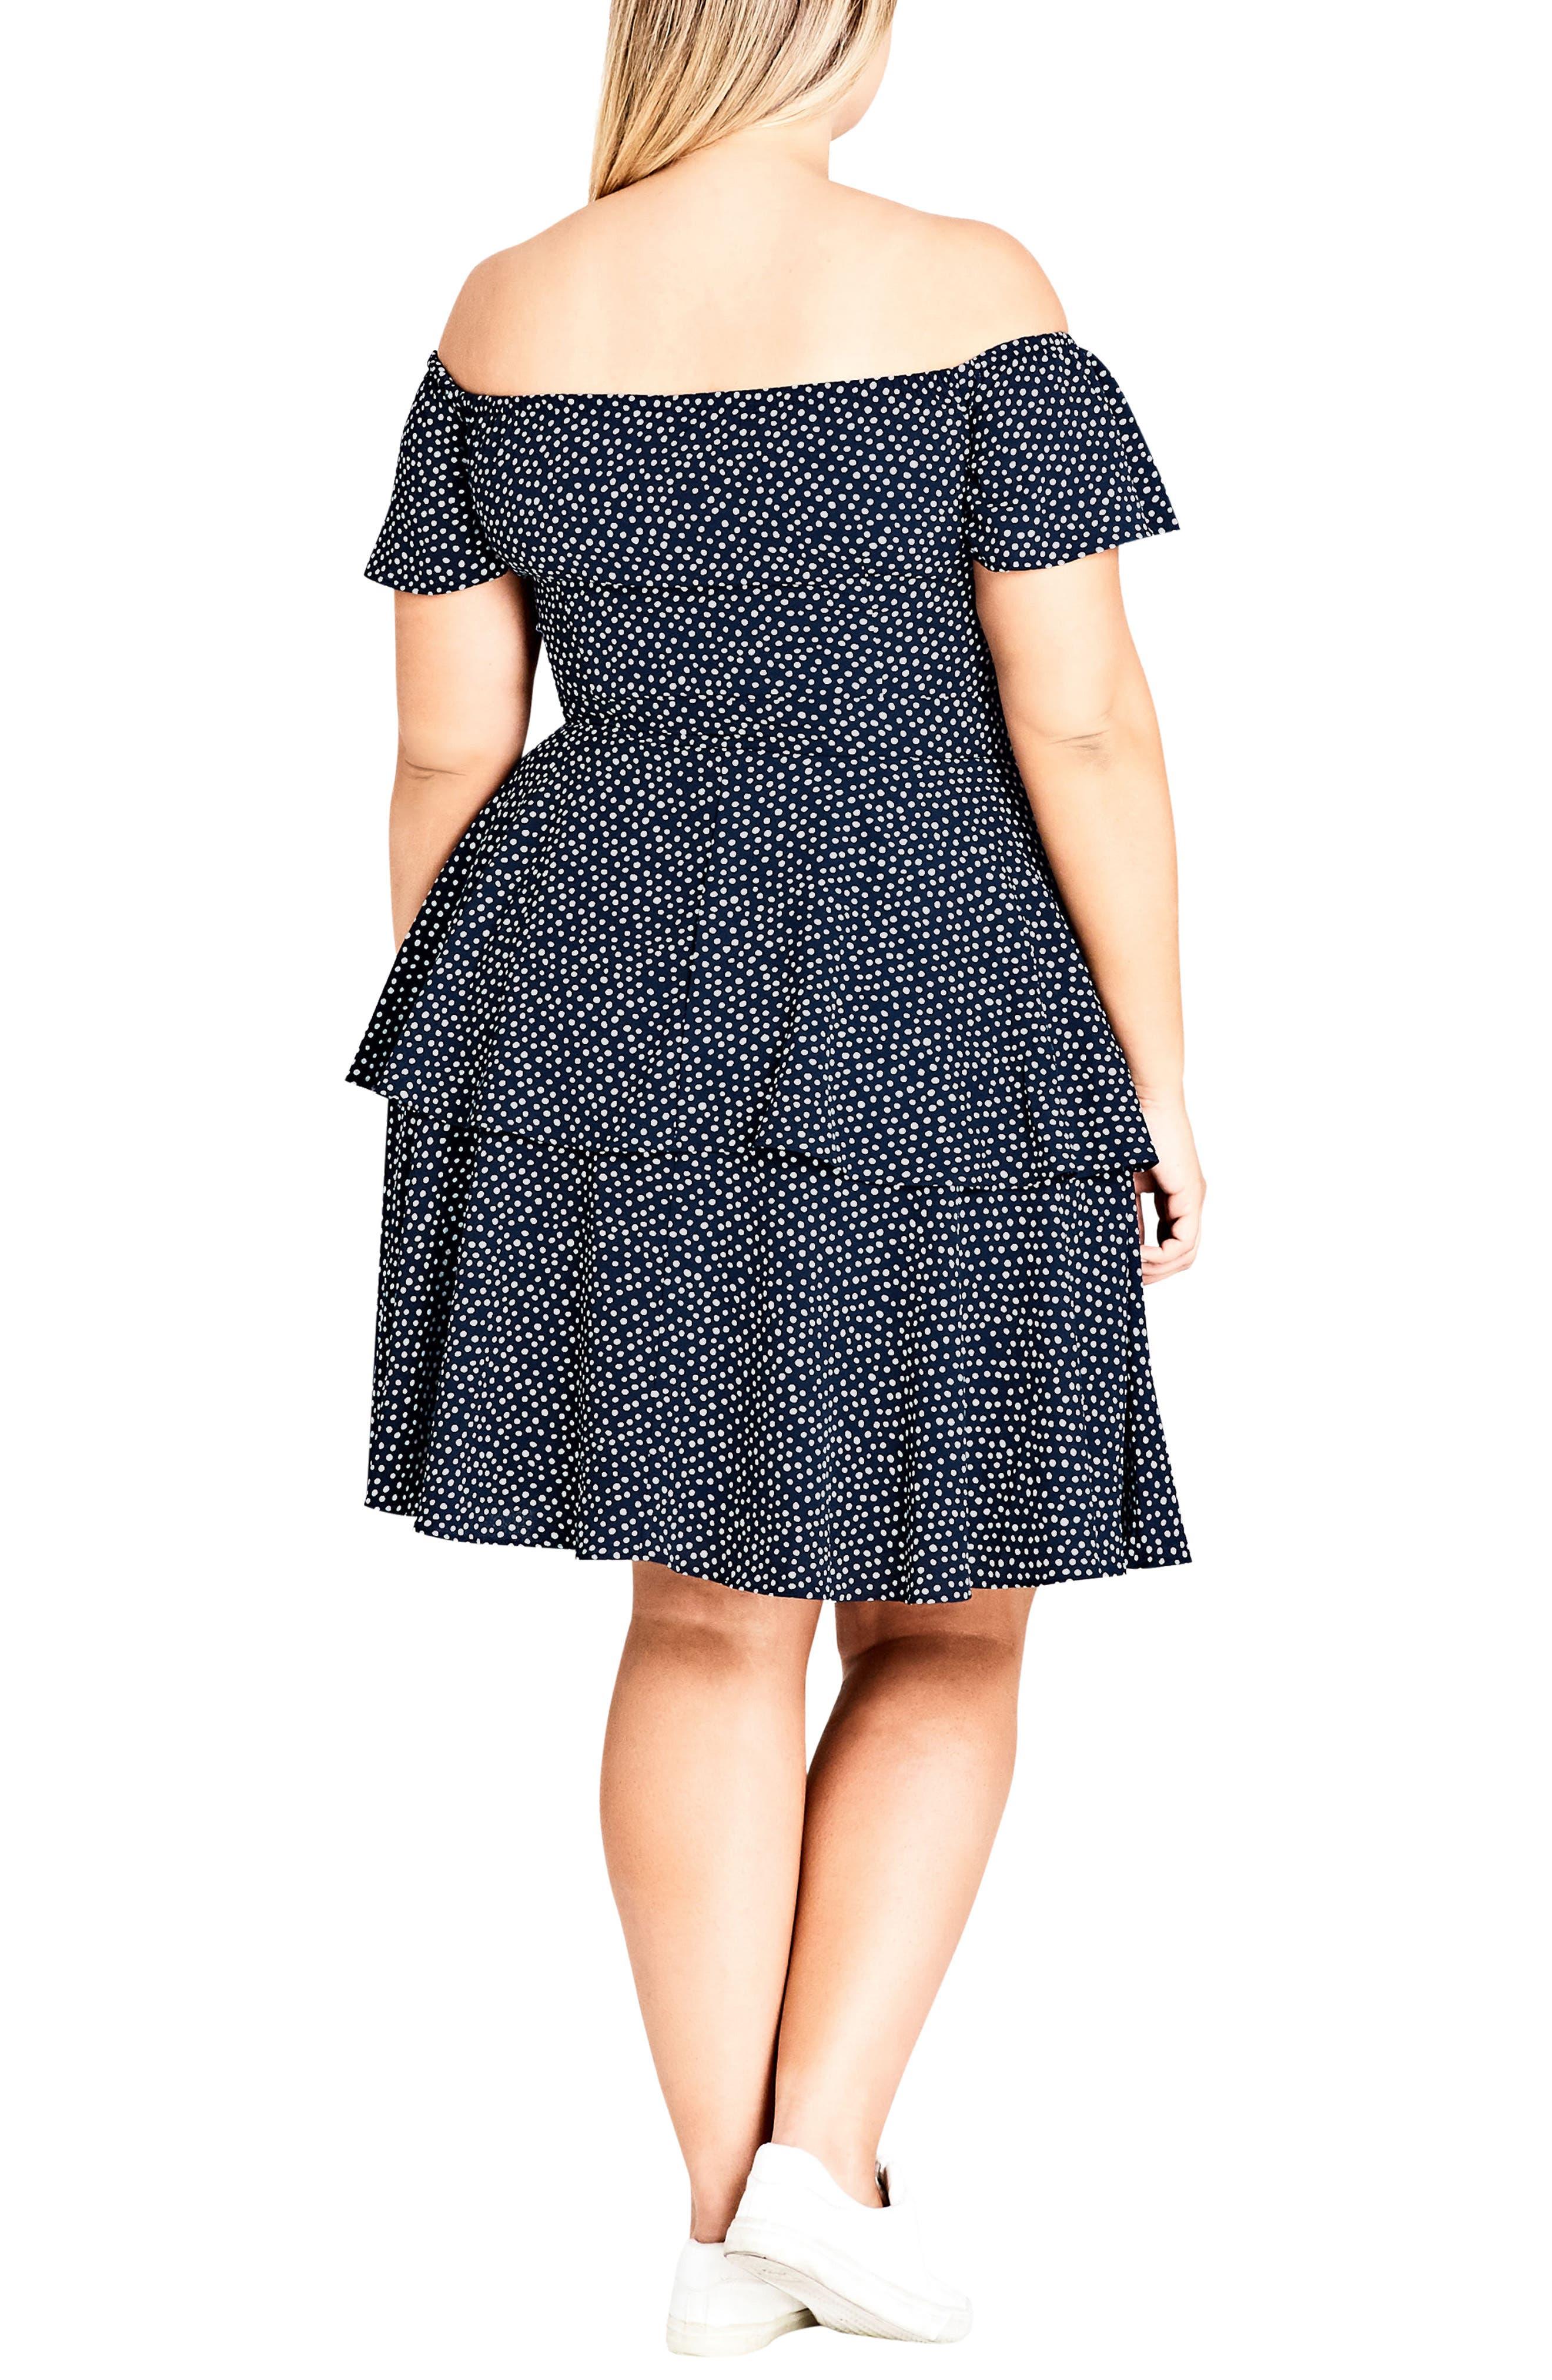 Spot Off the Shoulder Dress,                             Alternate thumbnail 2, color,                             NAVY SPOT